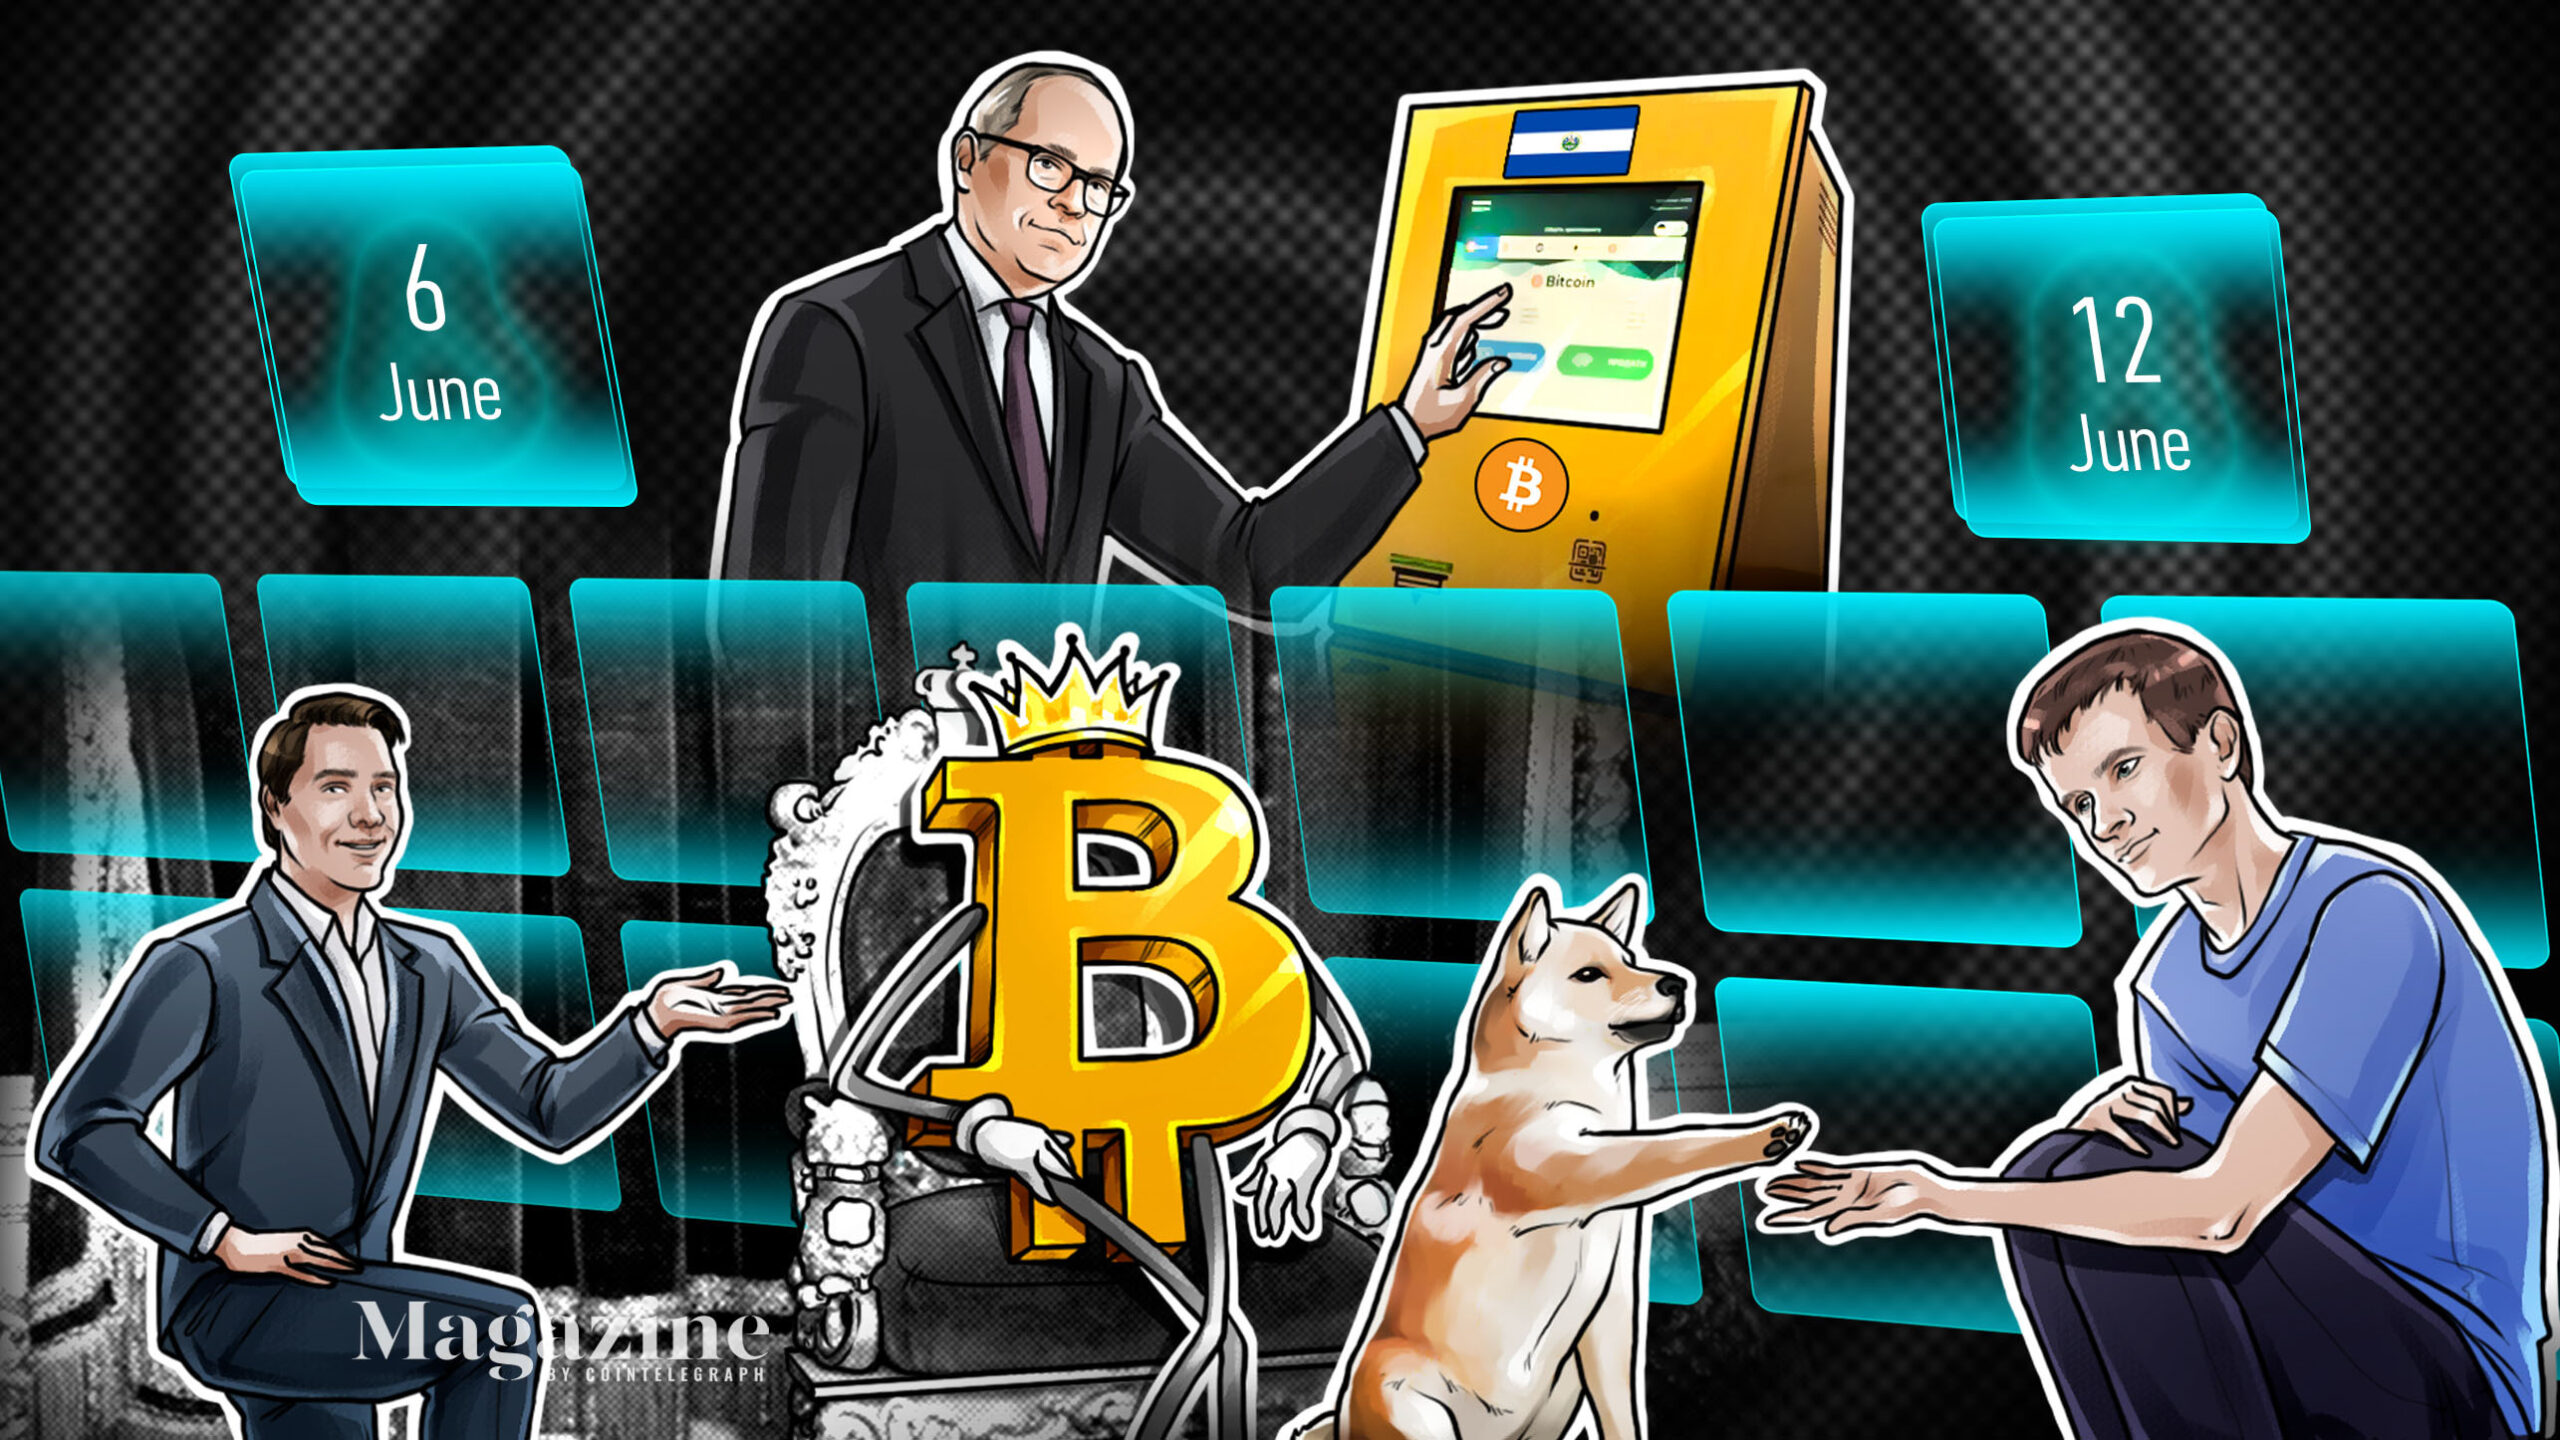 Bitcoin under threat, El Salvador rejected, Mark Cuban stung, McAfee 'has nothing'